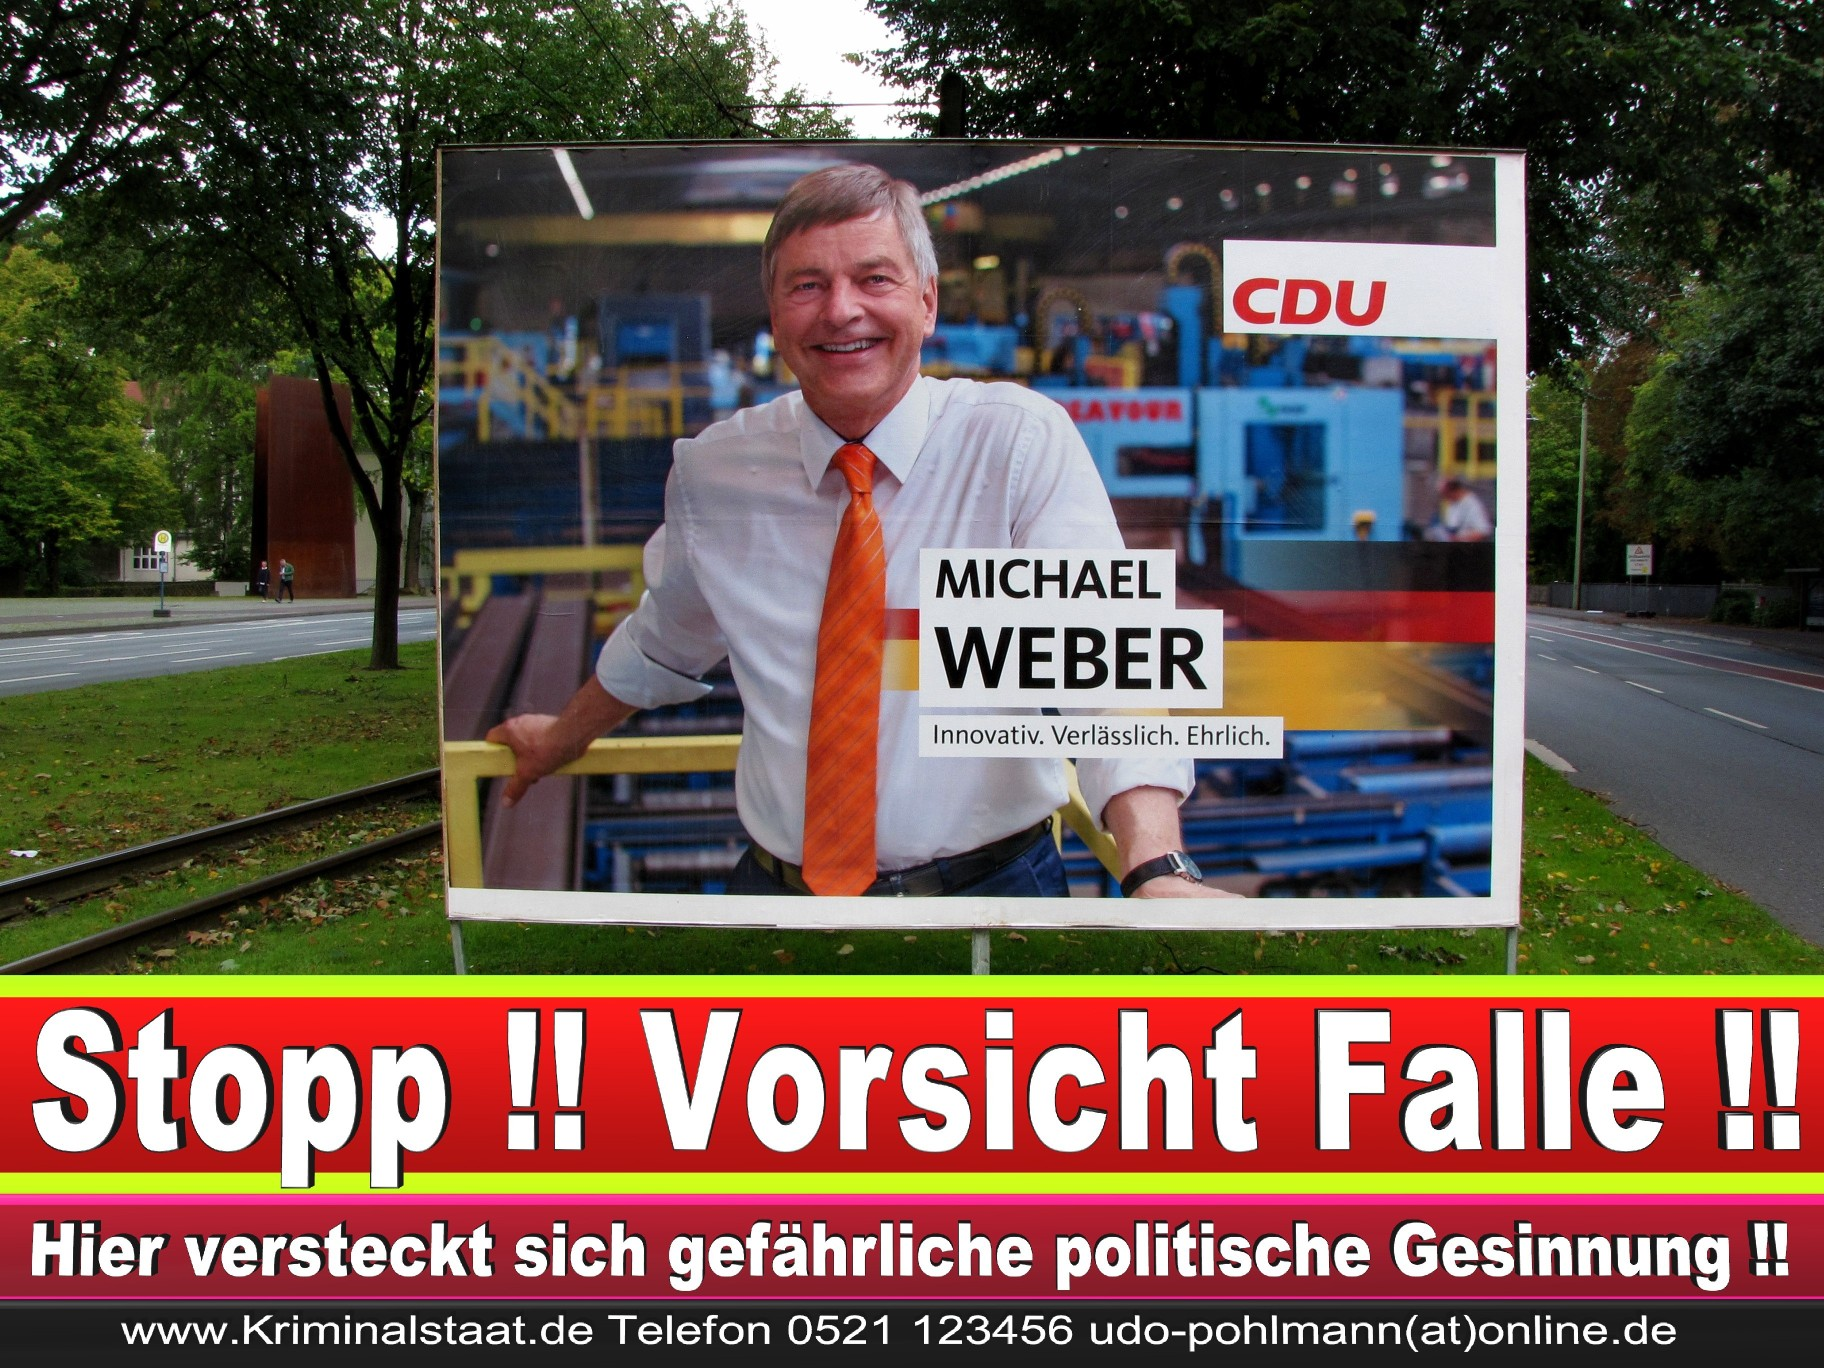 Michael Weber CDU Wahlplakat Wahlwerbung Bielefeld Volksverhetzung Durch Religion 4